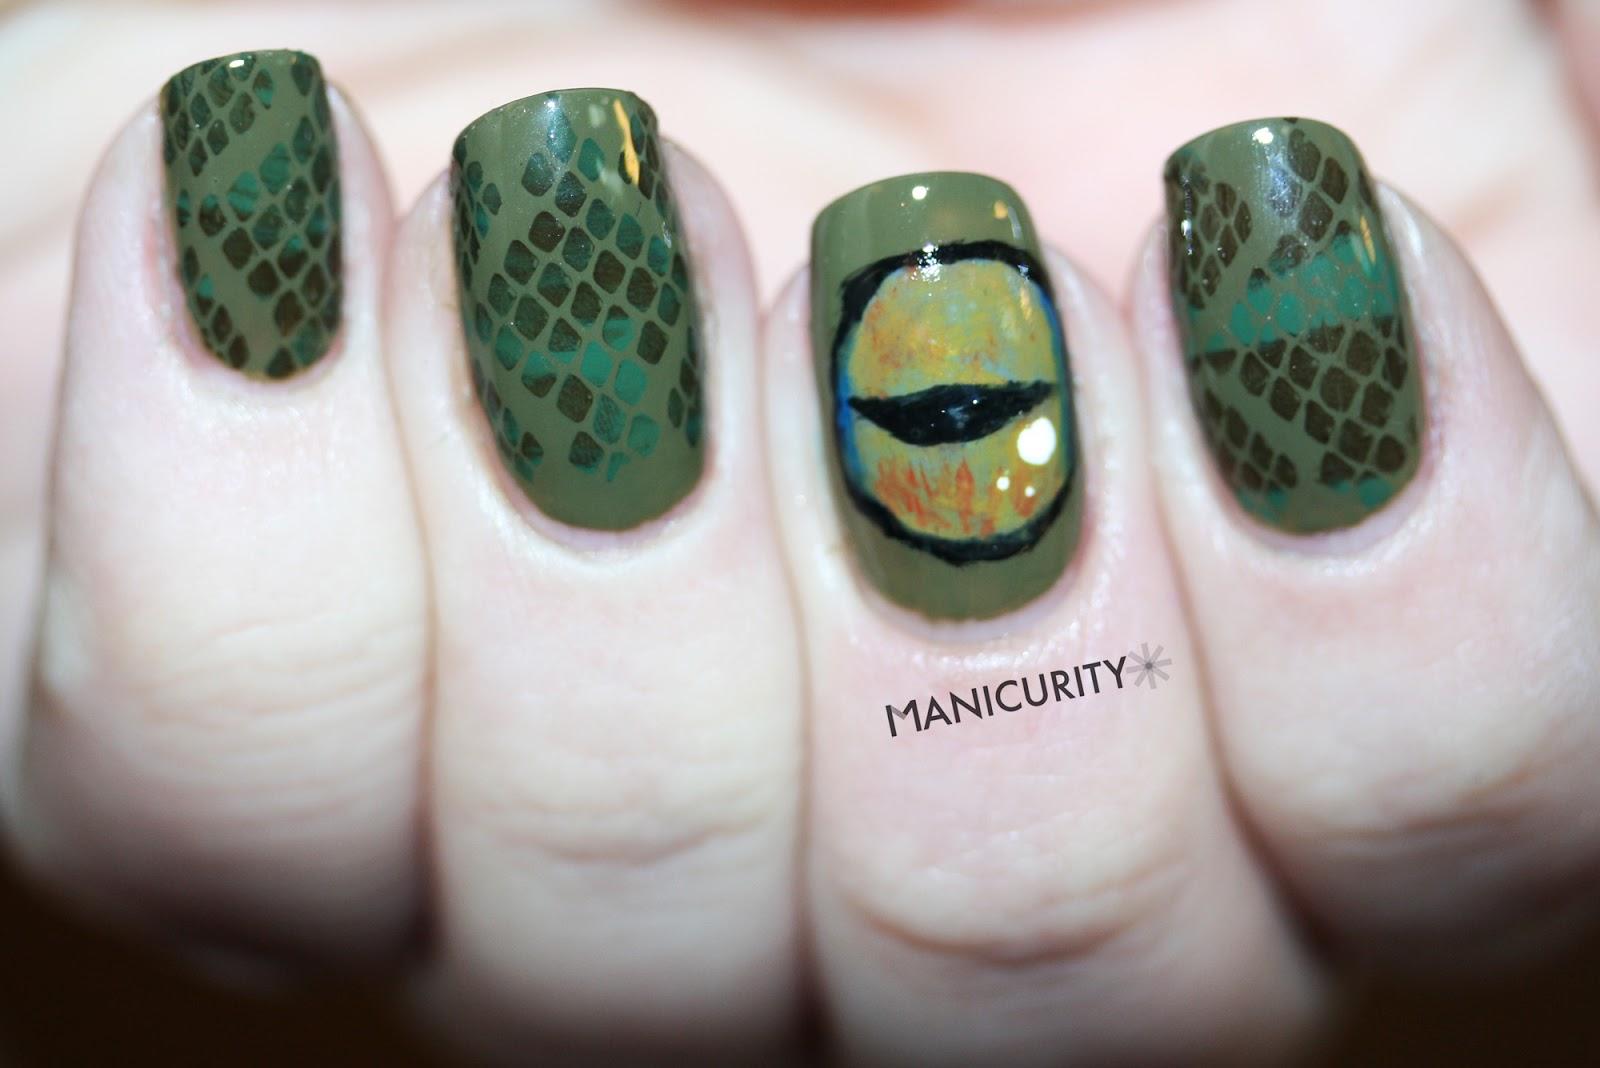 Manicurity: January 2013